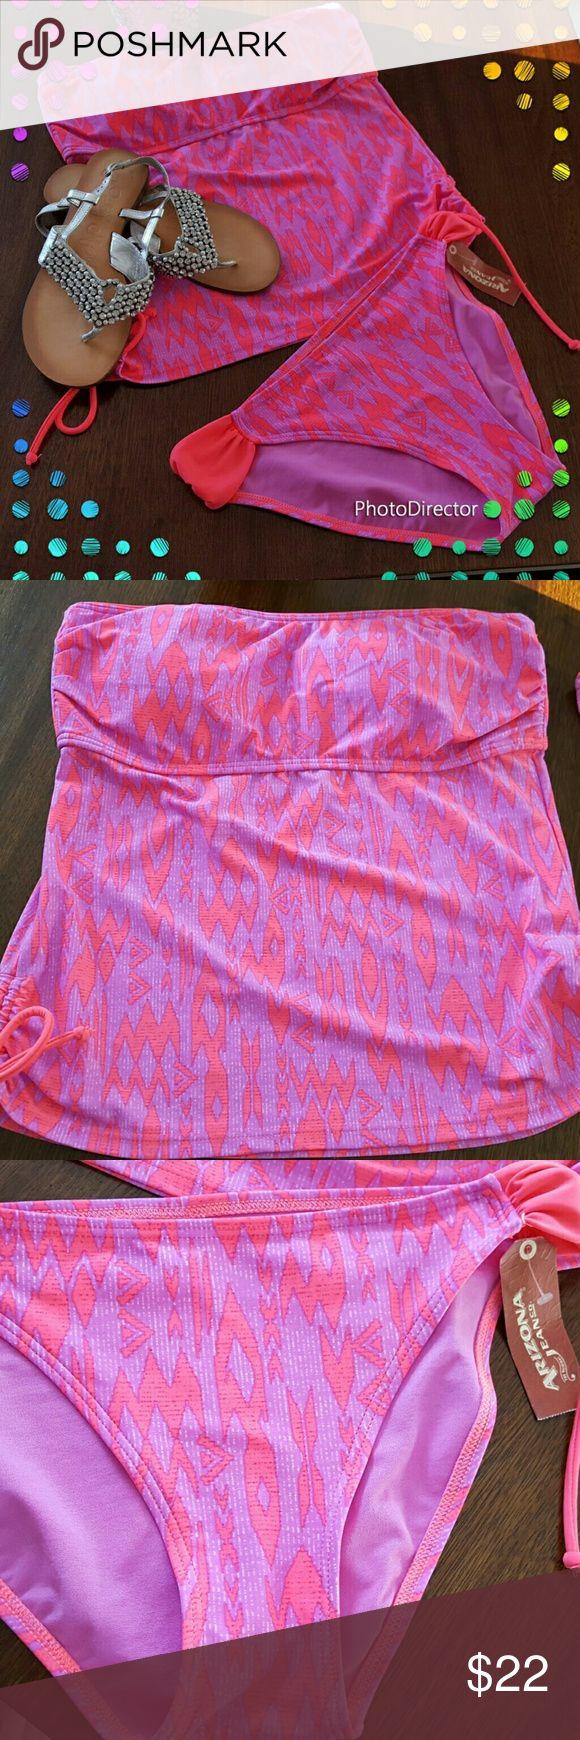 ARIZONA TANKINI Cute, colorful Arozona tankini in size large. Never worn, tag still attached. Straps that attach to top are missing. Arizona Jean Company Swim Bikinis